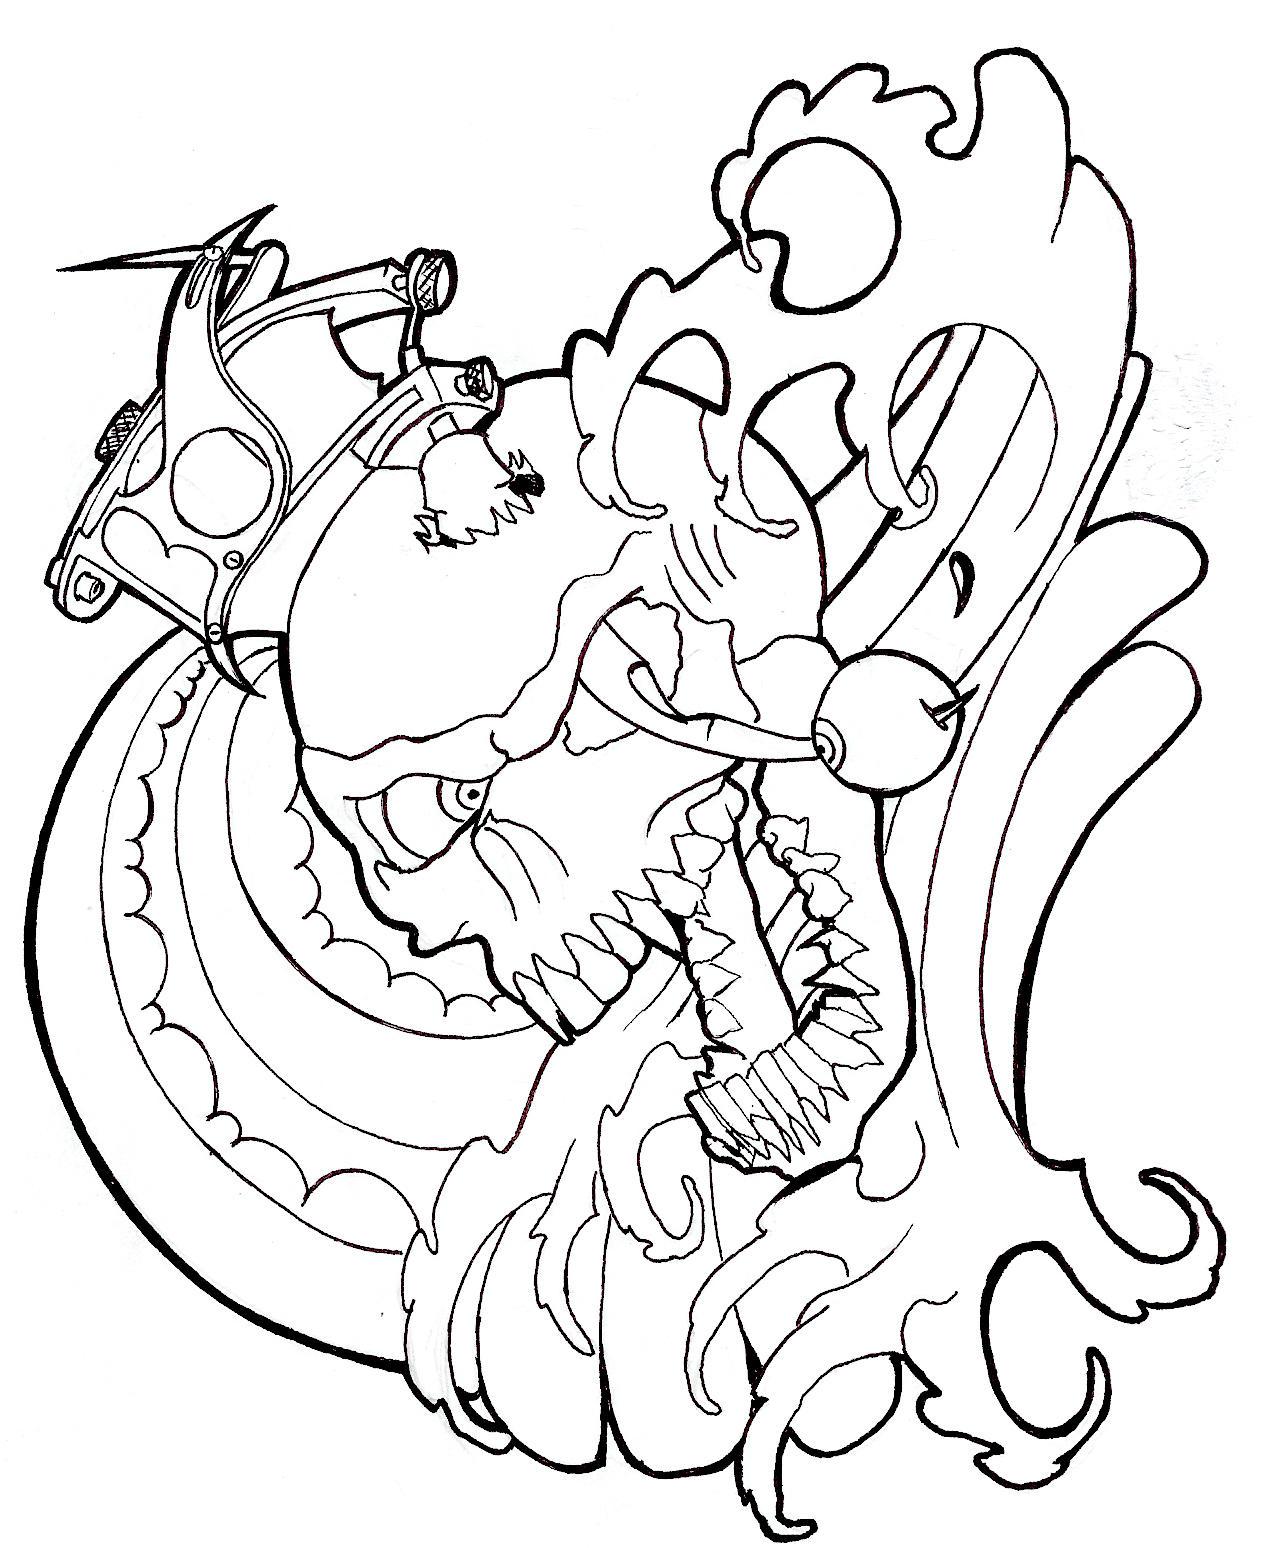 Tattoo Gun Stab By CloudOne On DeviantArt